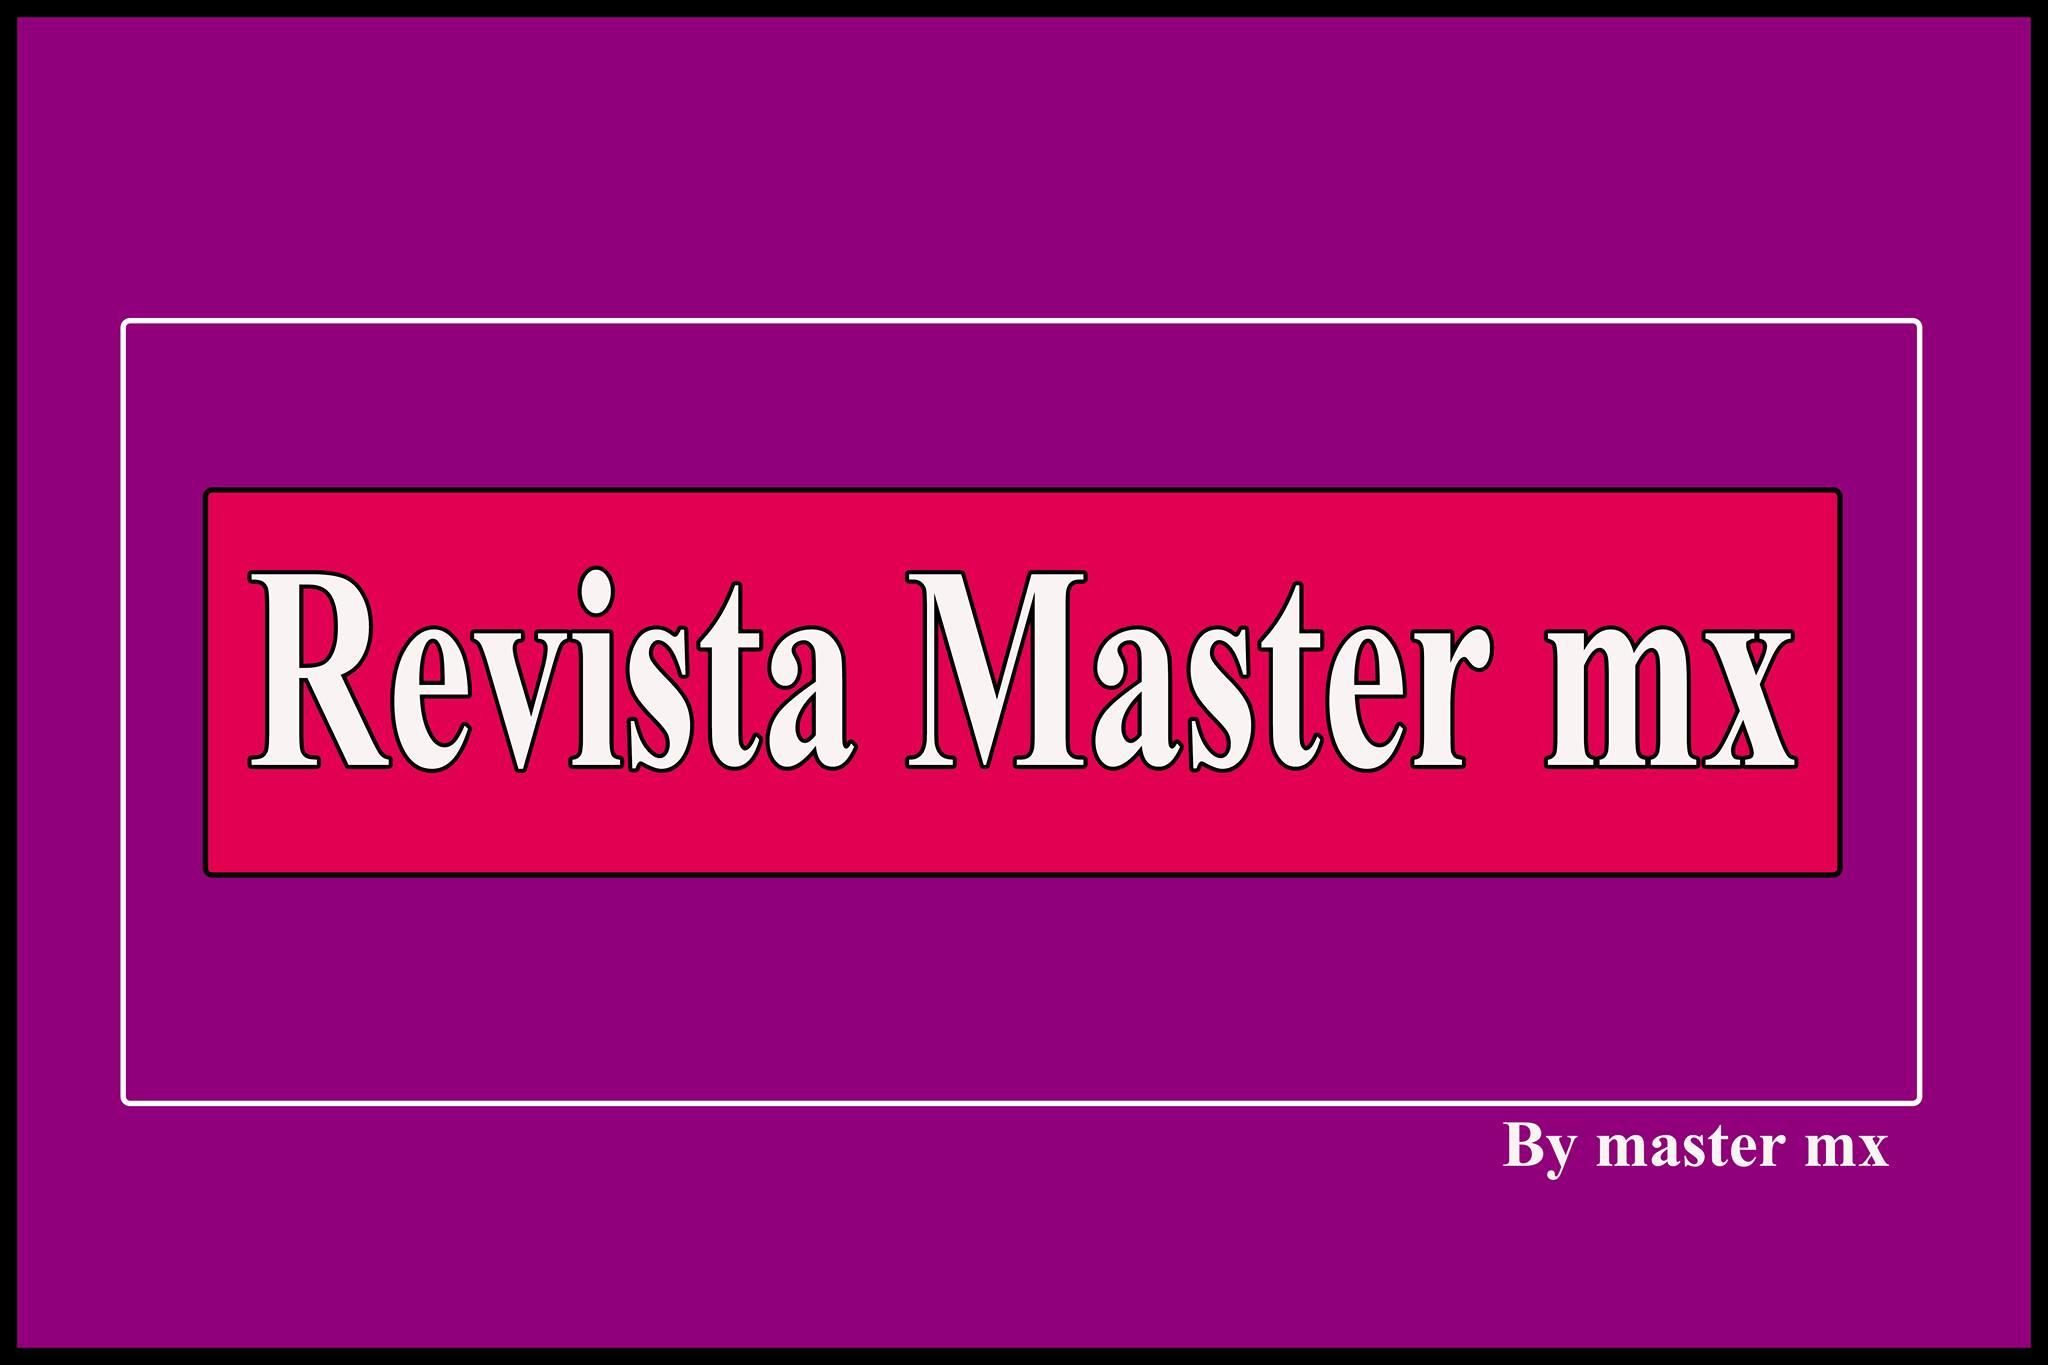 Avatar - Master Mx